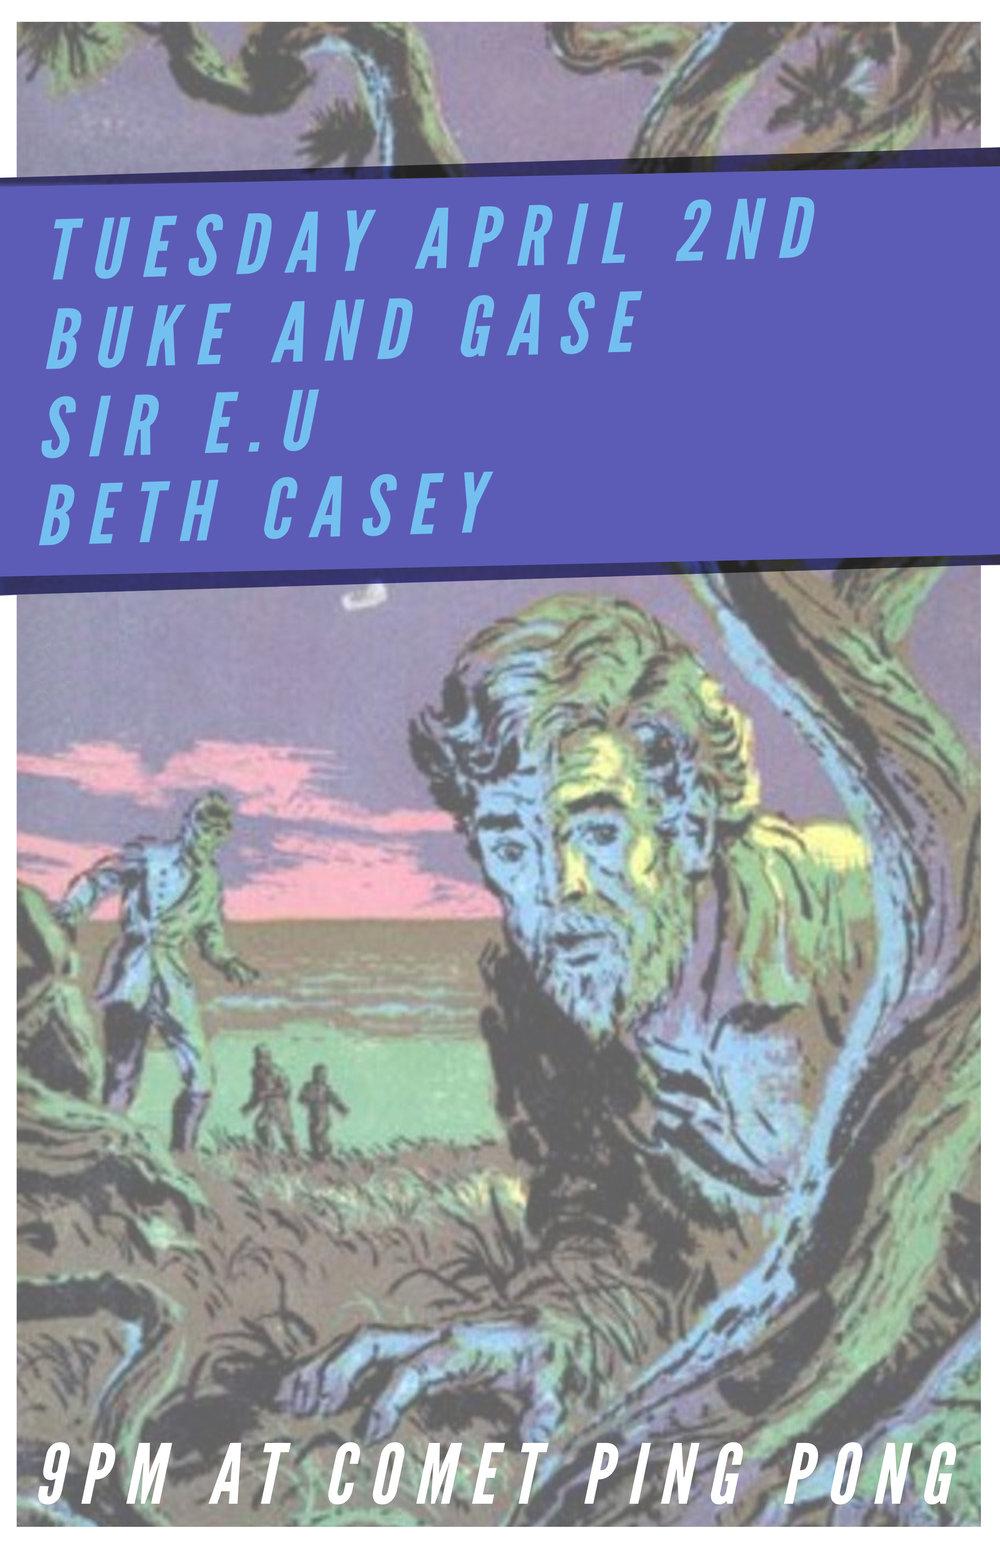 buke and gase poster.jpg